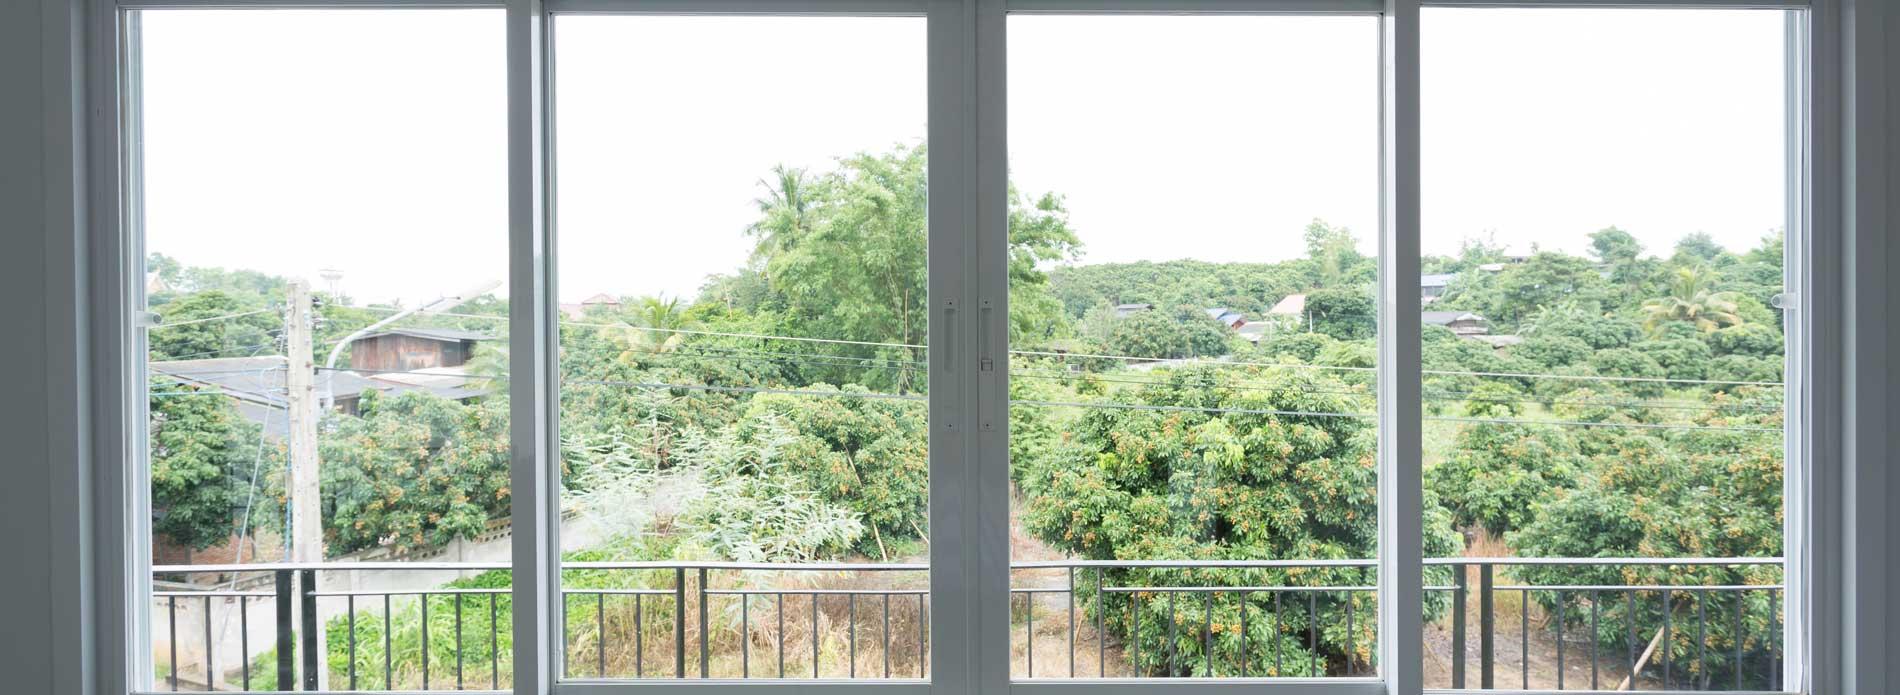 large windows overlooking trees